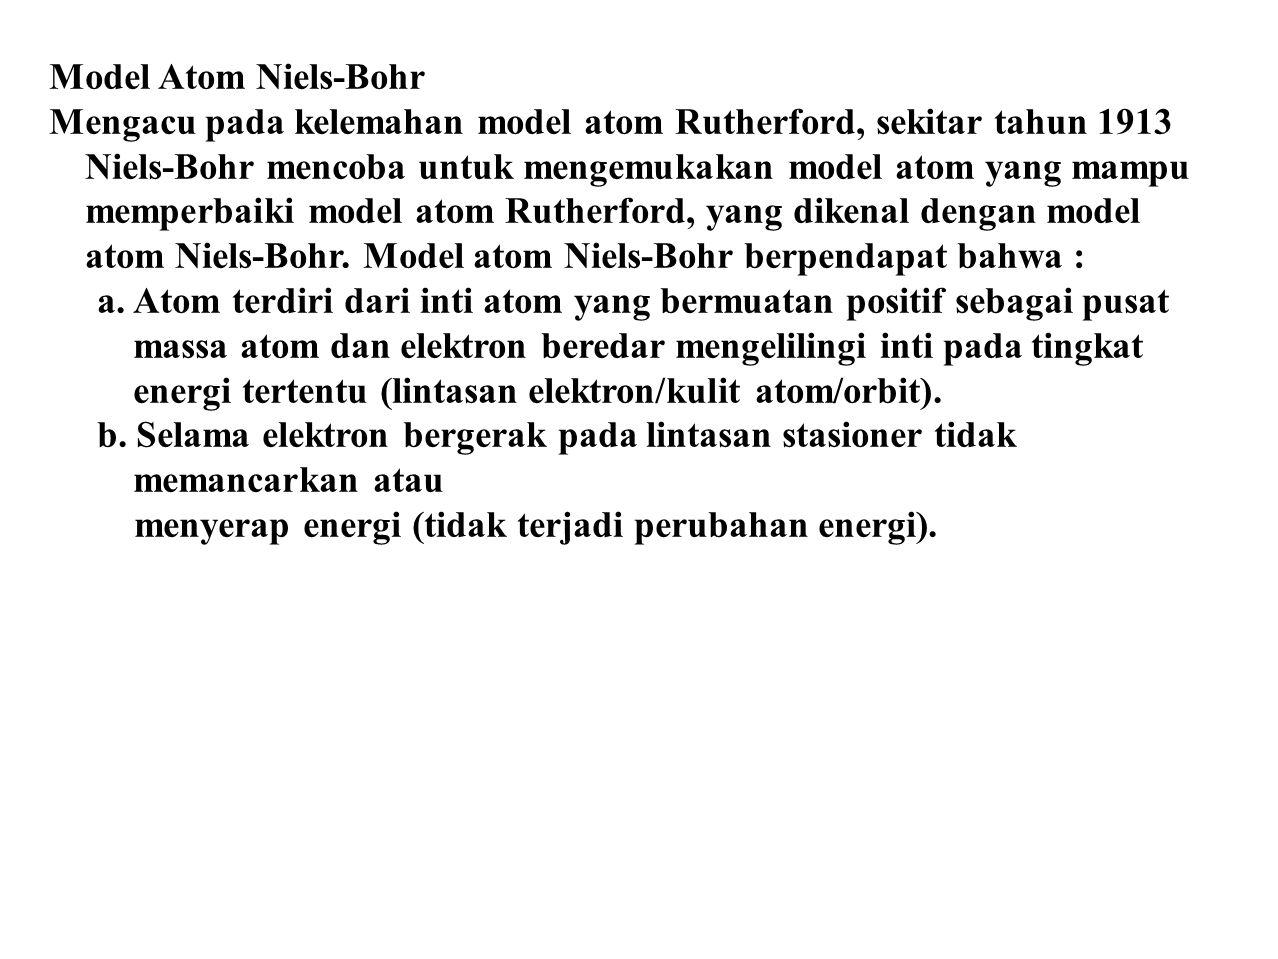 Model Atom Niels-Bohr